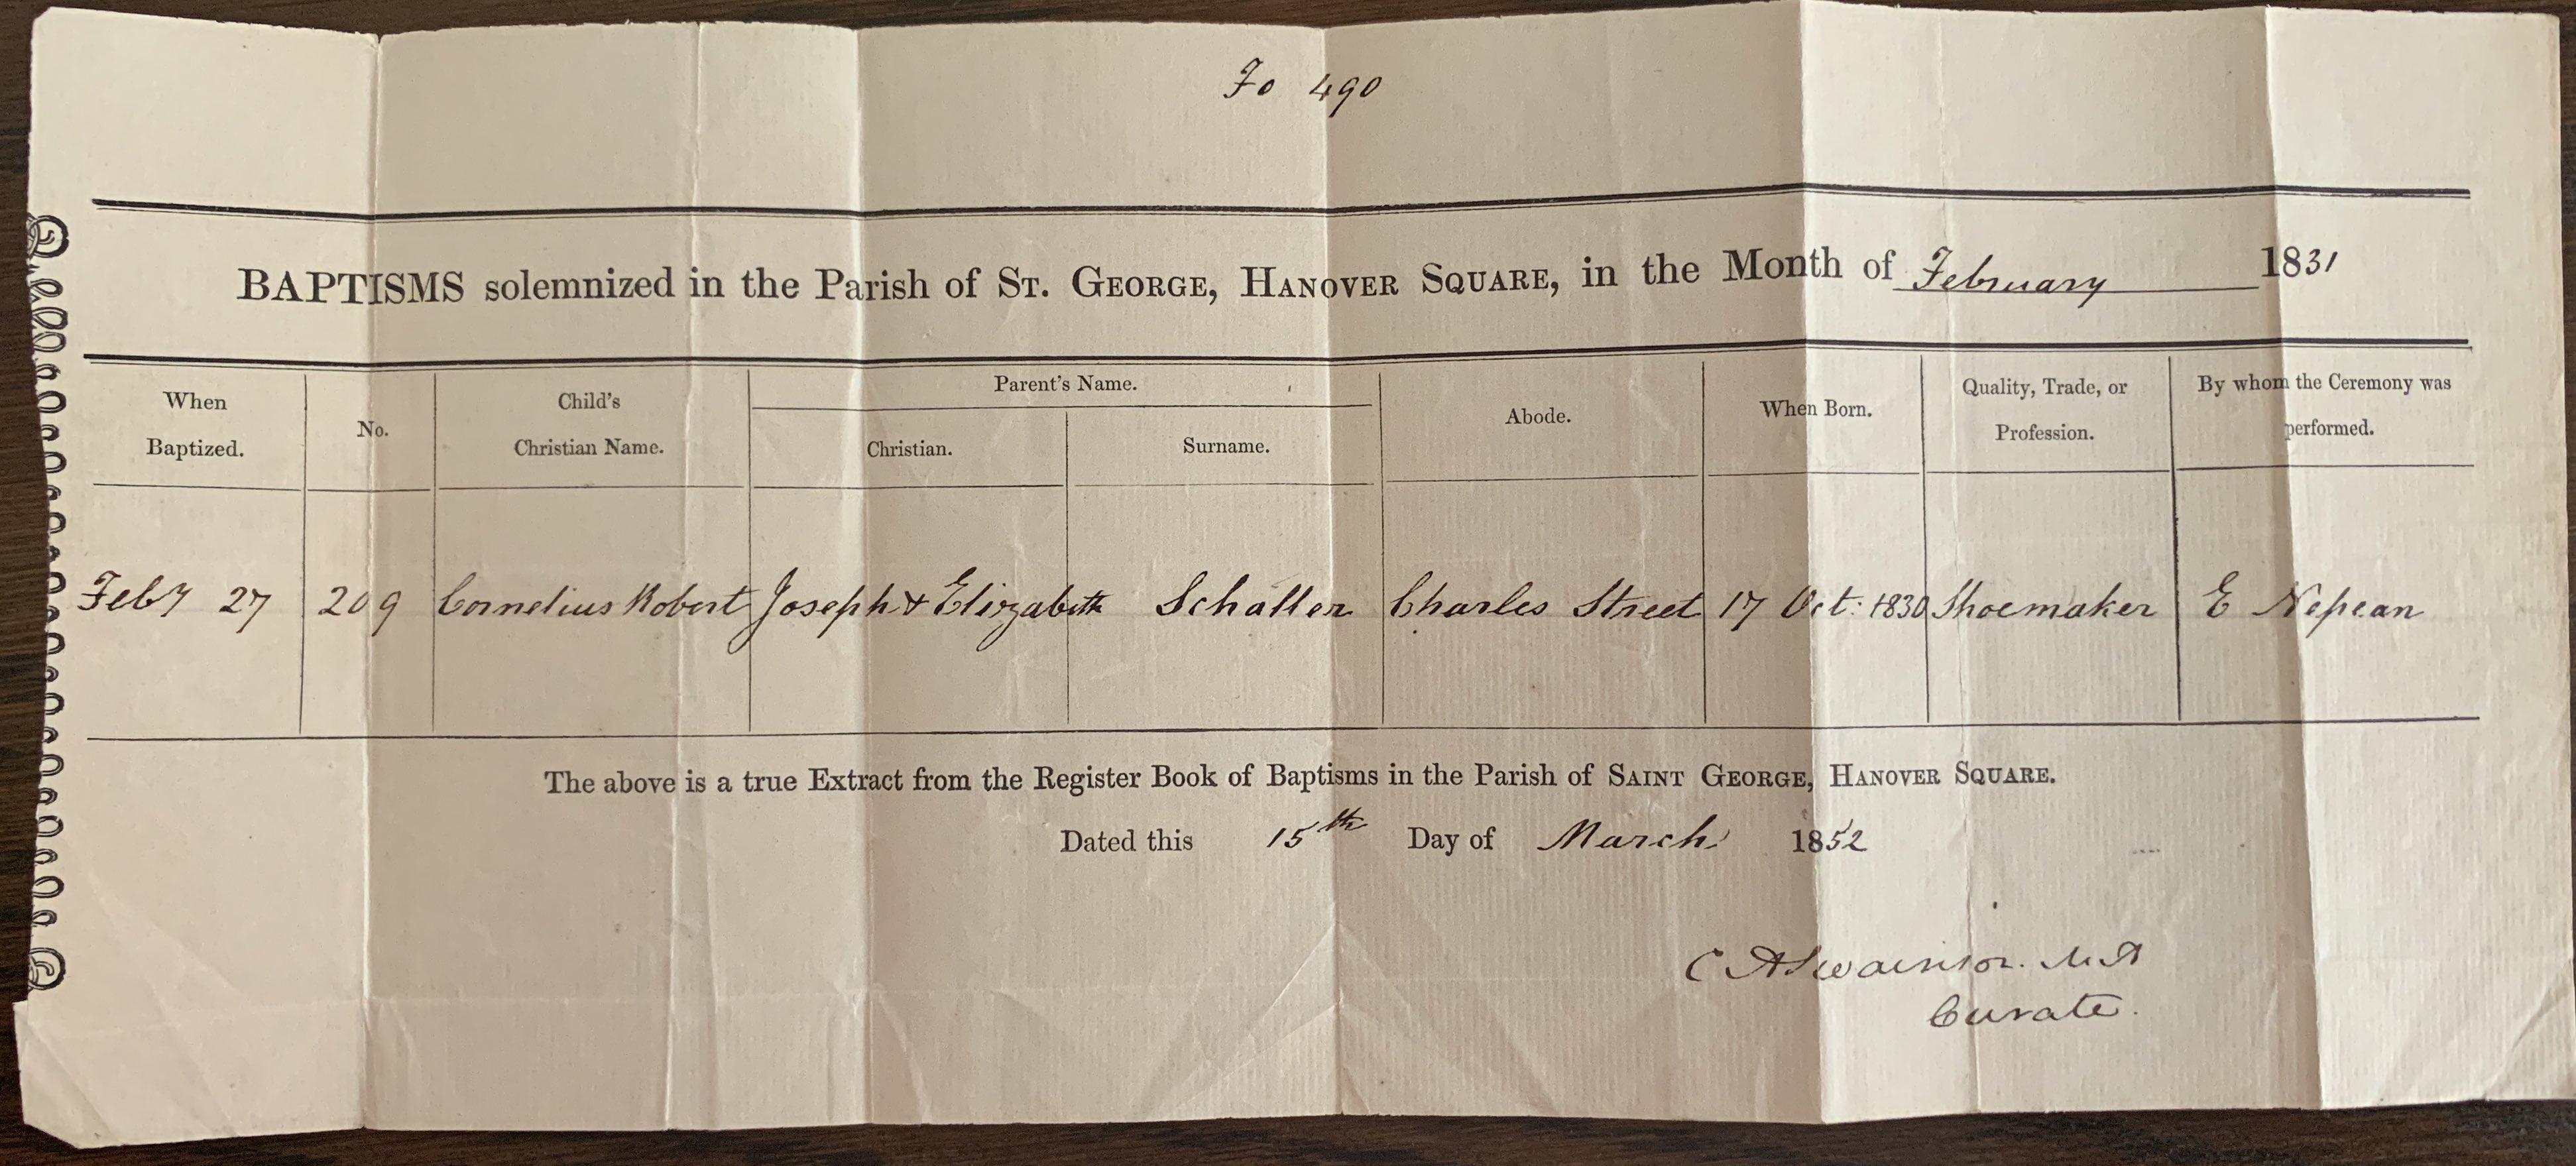 CR Schaller baptism certificate 1831.